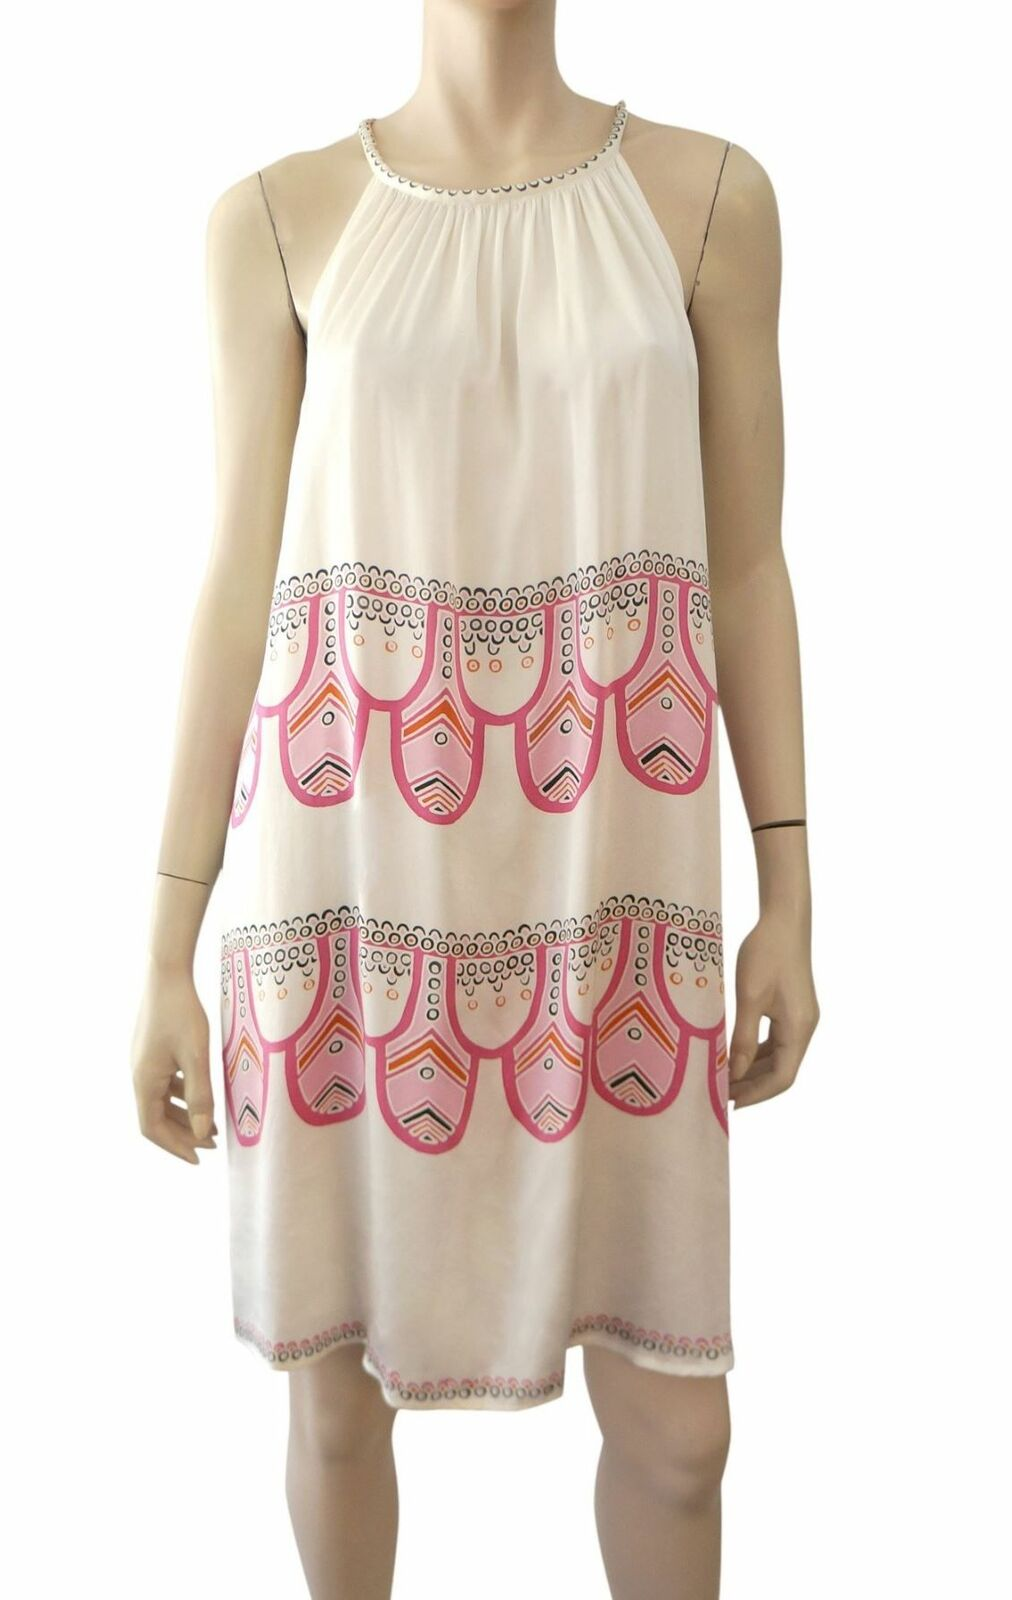 ELISSA COLEMAN Ivory Pink Pink Pink Sleeveless Silk Print Dress L 223357